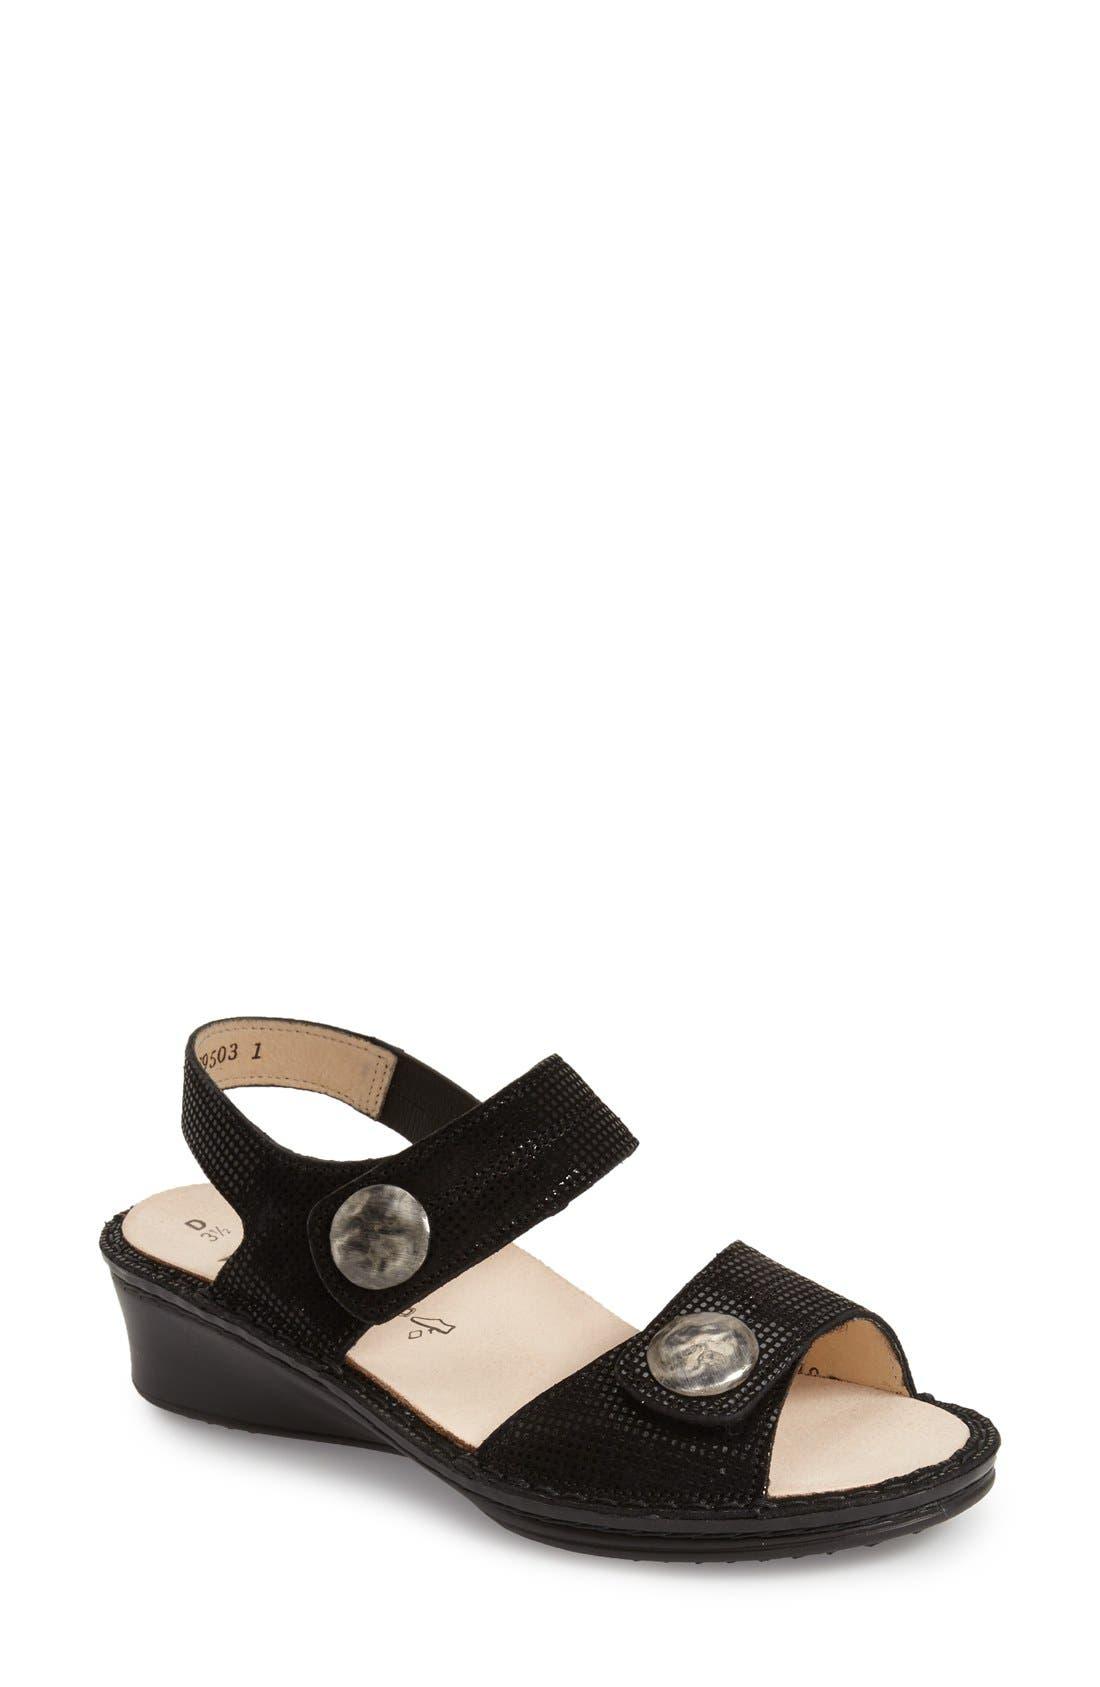 'Alanya' Sandal,                         Main,                         color, 002